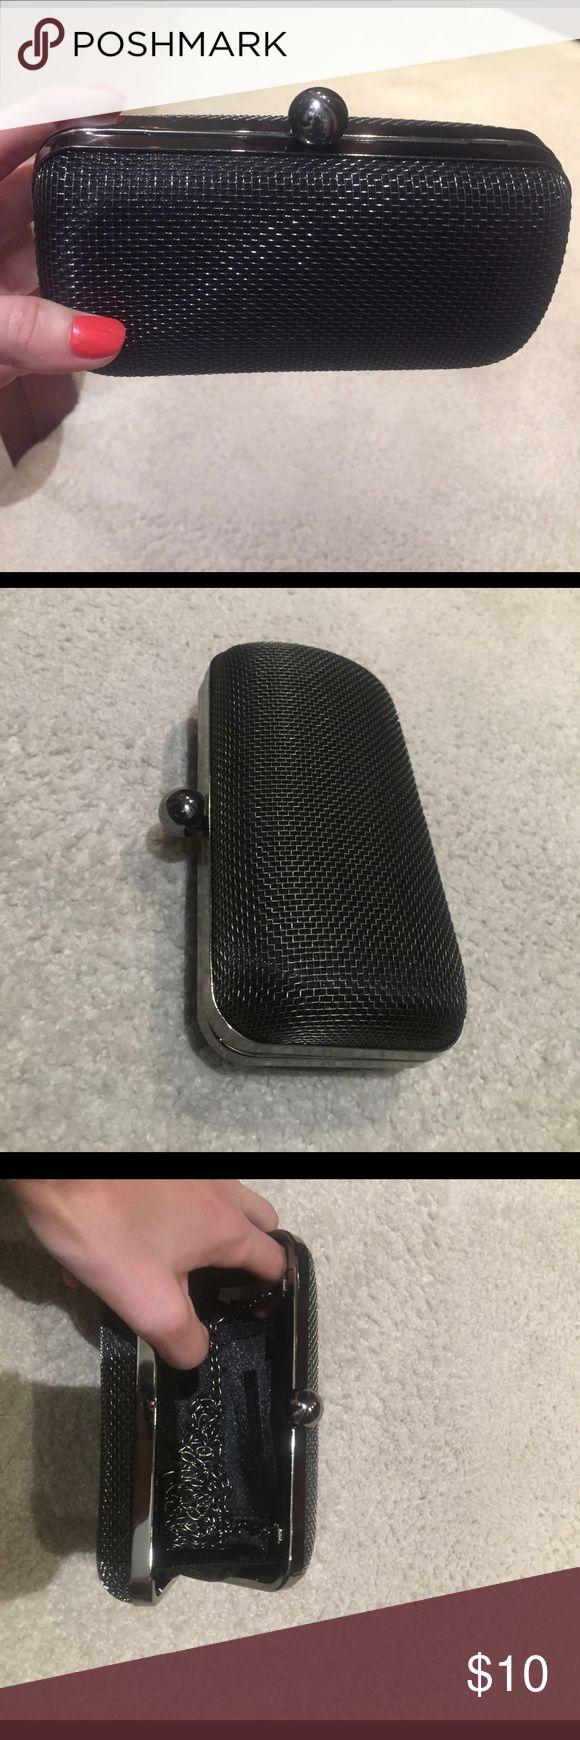 Black metallic clutch Black metallic clutch Bags Clutches & Wristlets